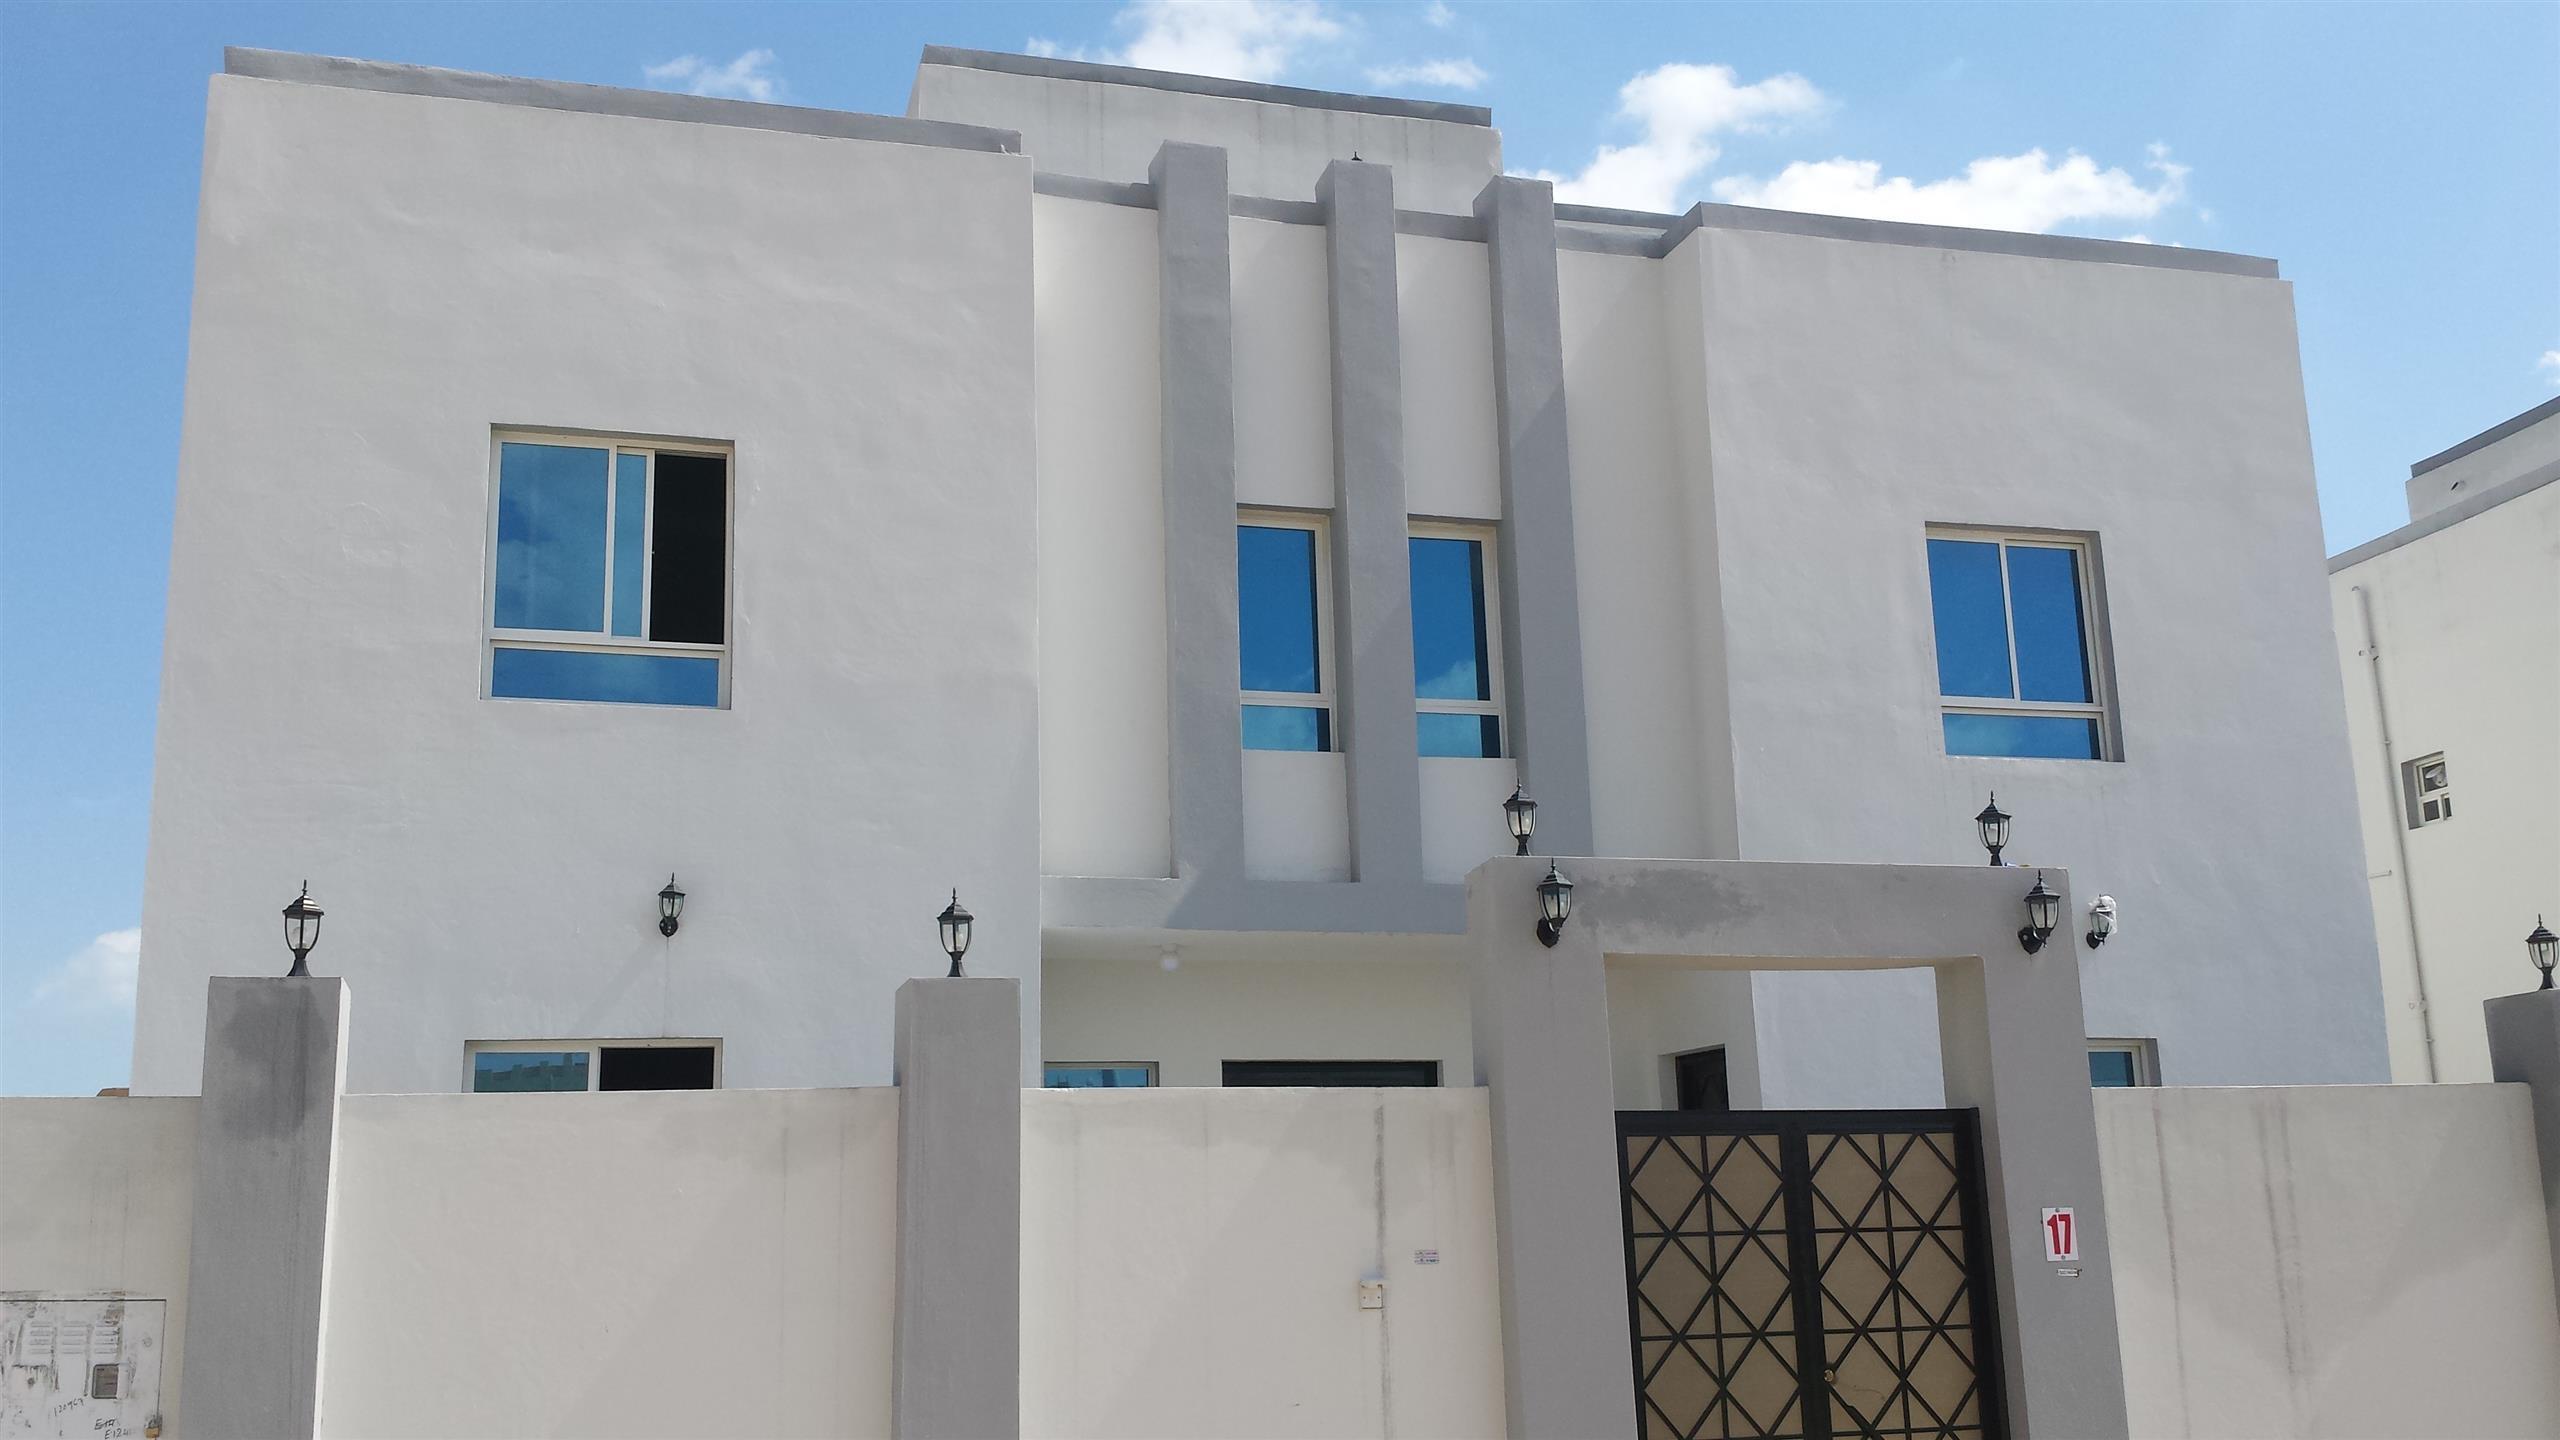 11 Rooms,3 Halls,2 Kitchen # 8-Villas For Staffs,L